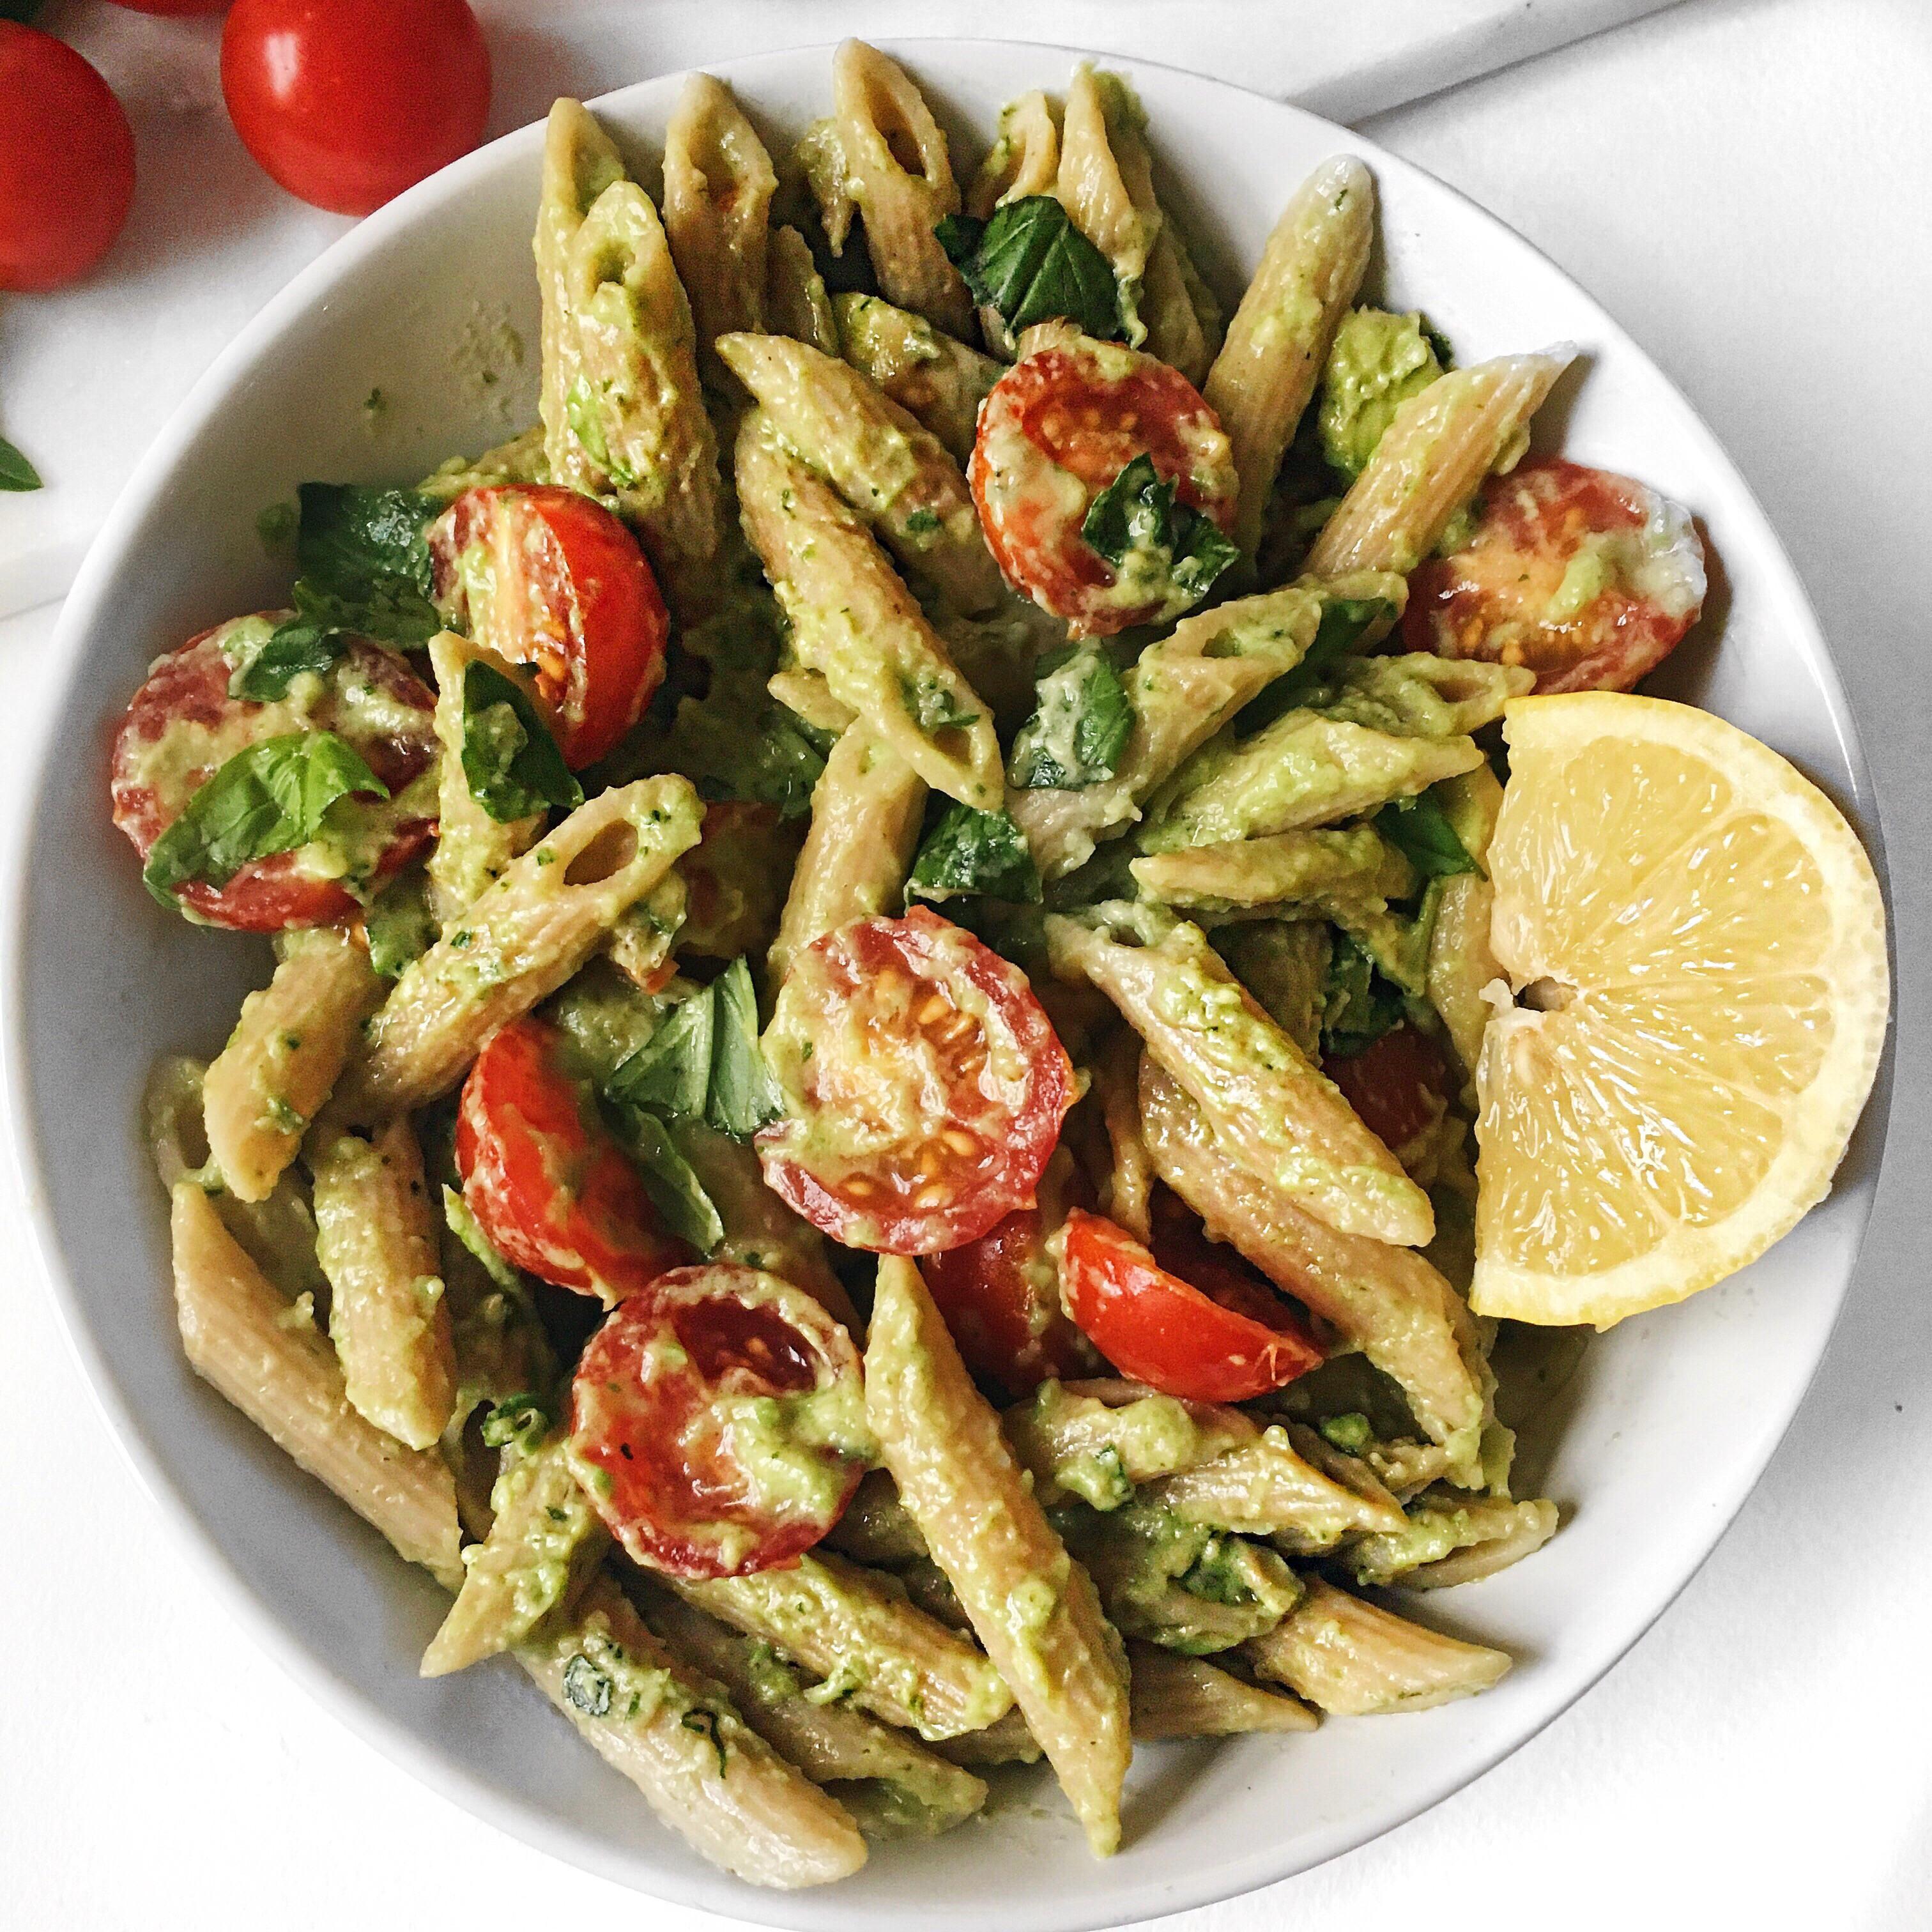 Gluten Free Vegan Recipes  Quick and Easy Basil Avocado Pasta